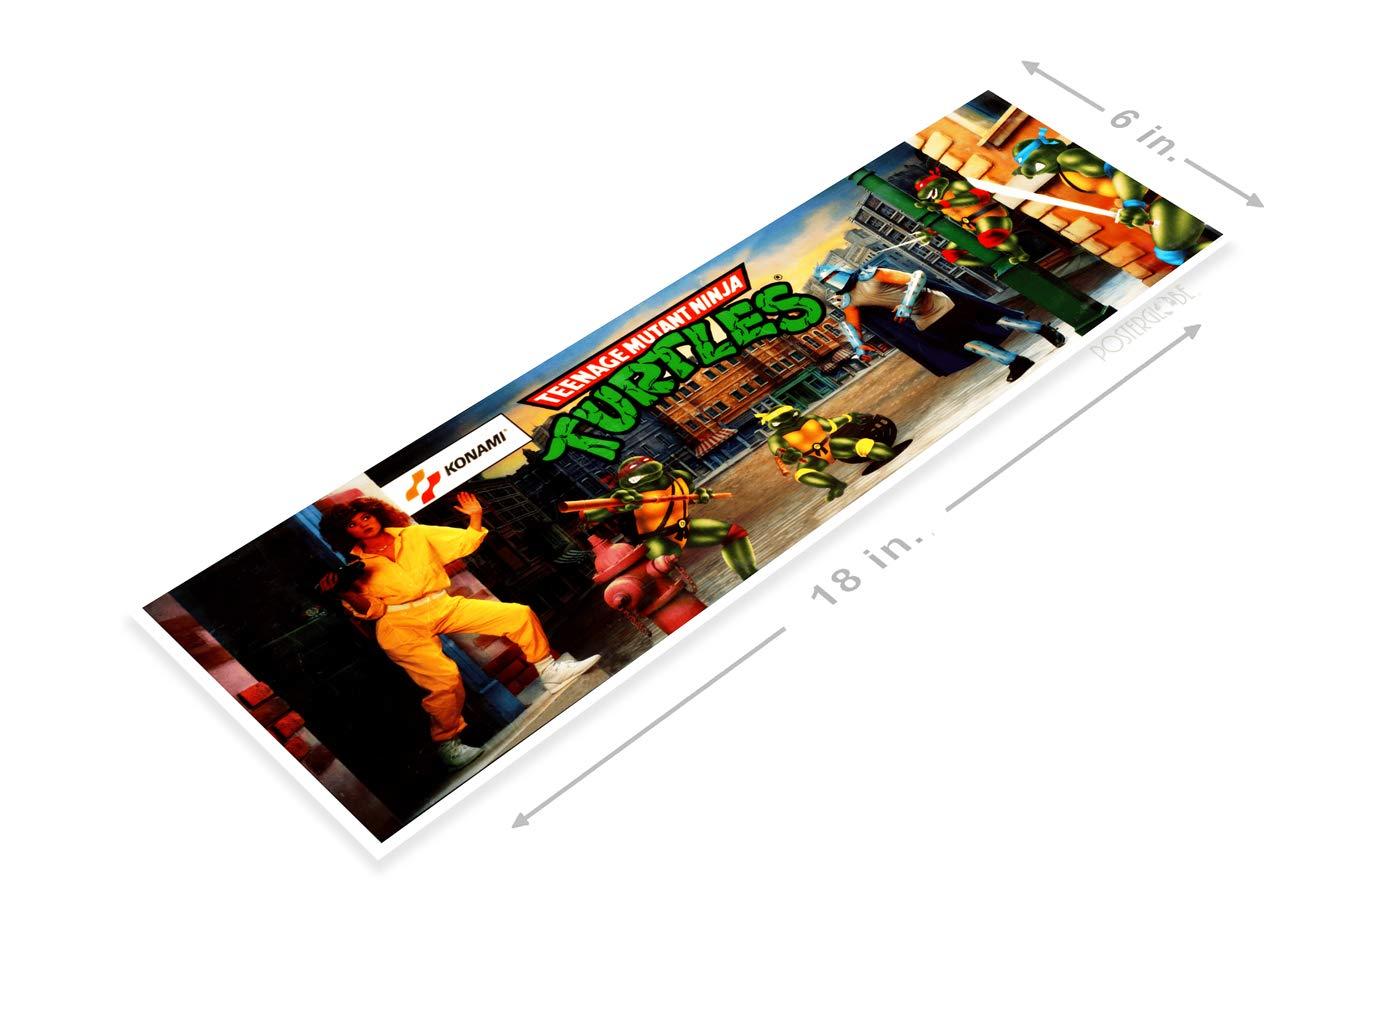 Amazon.com: PosterGlobe Poster A524 Ninja Turtles Arcade ...